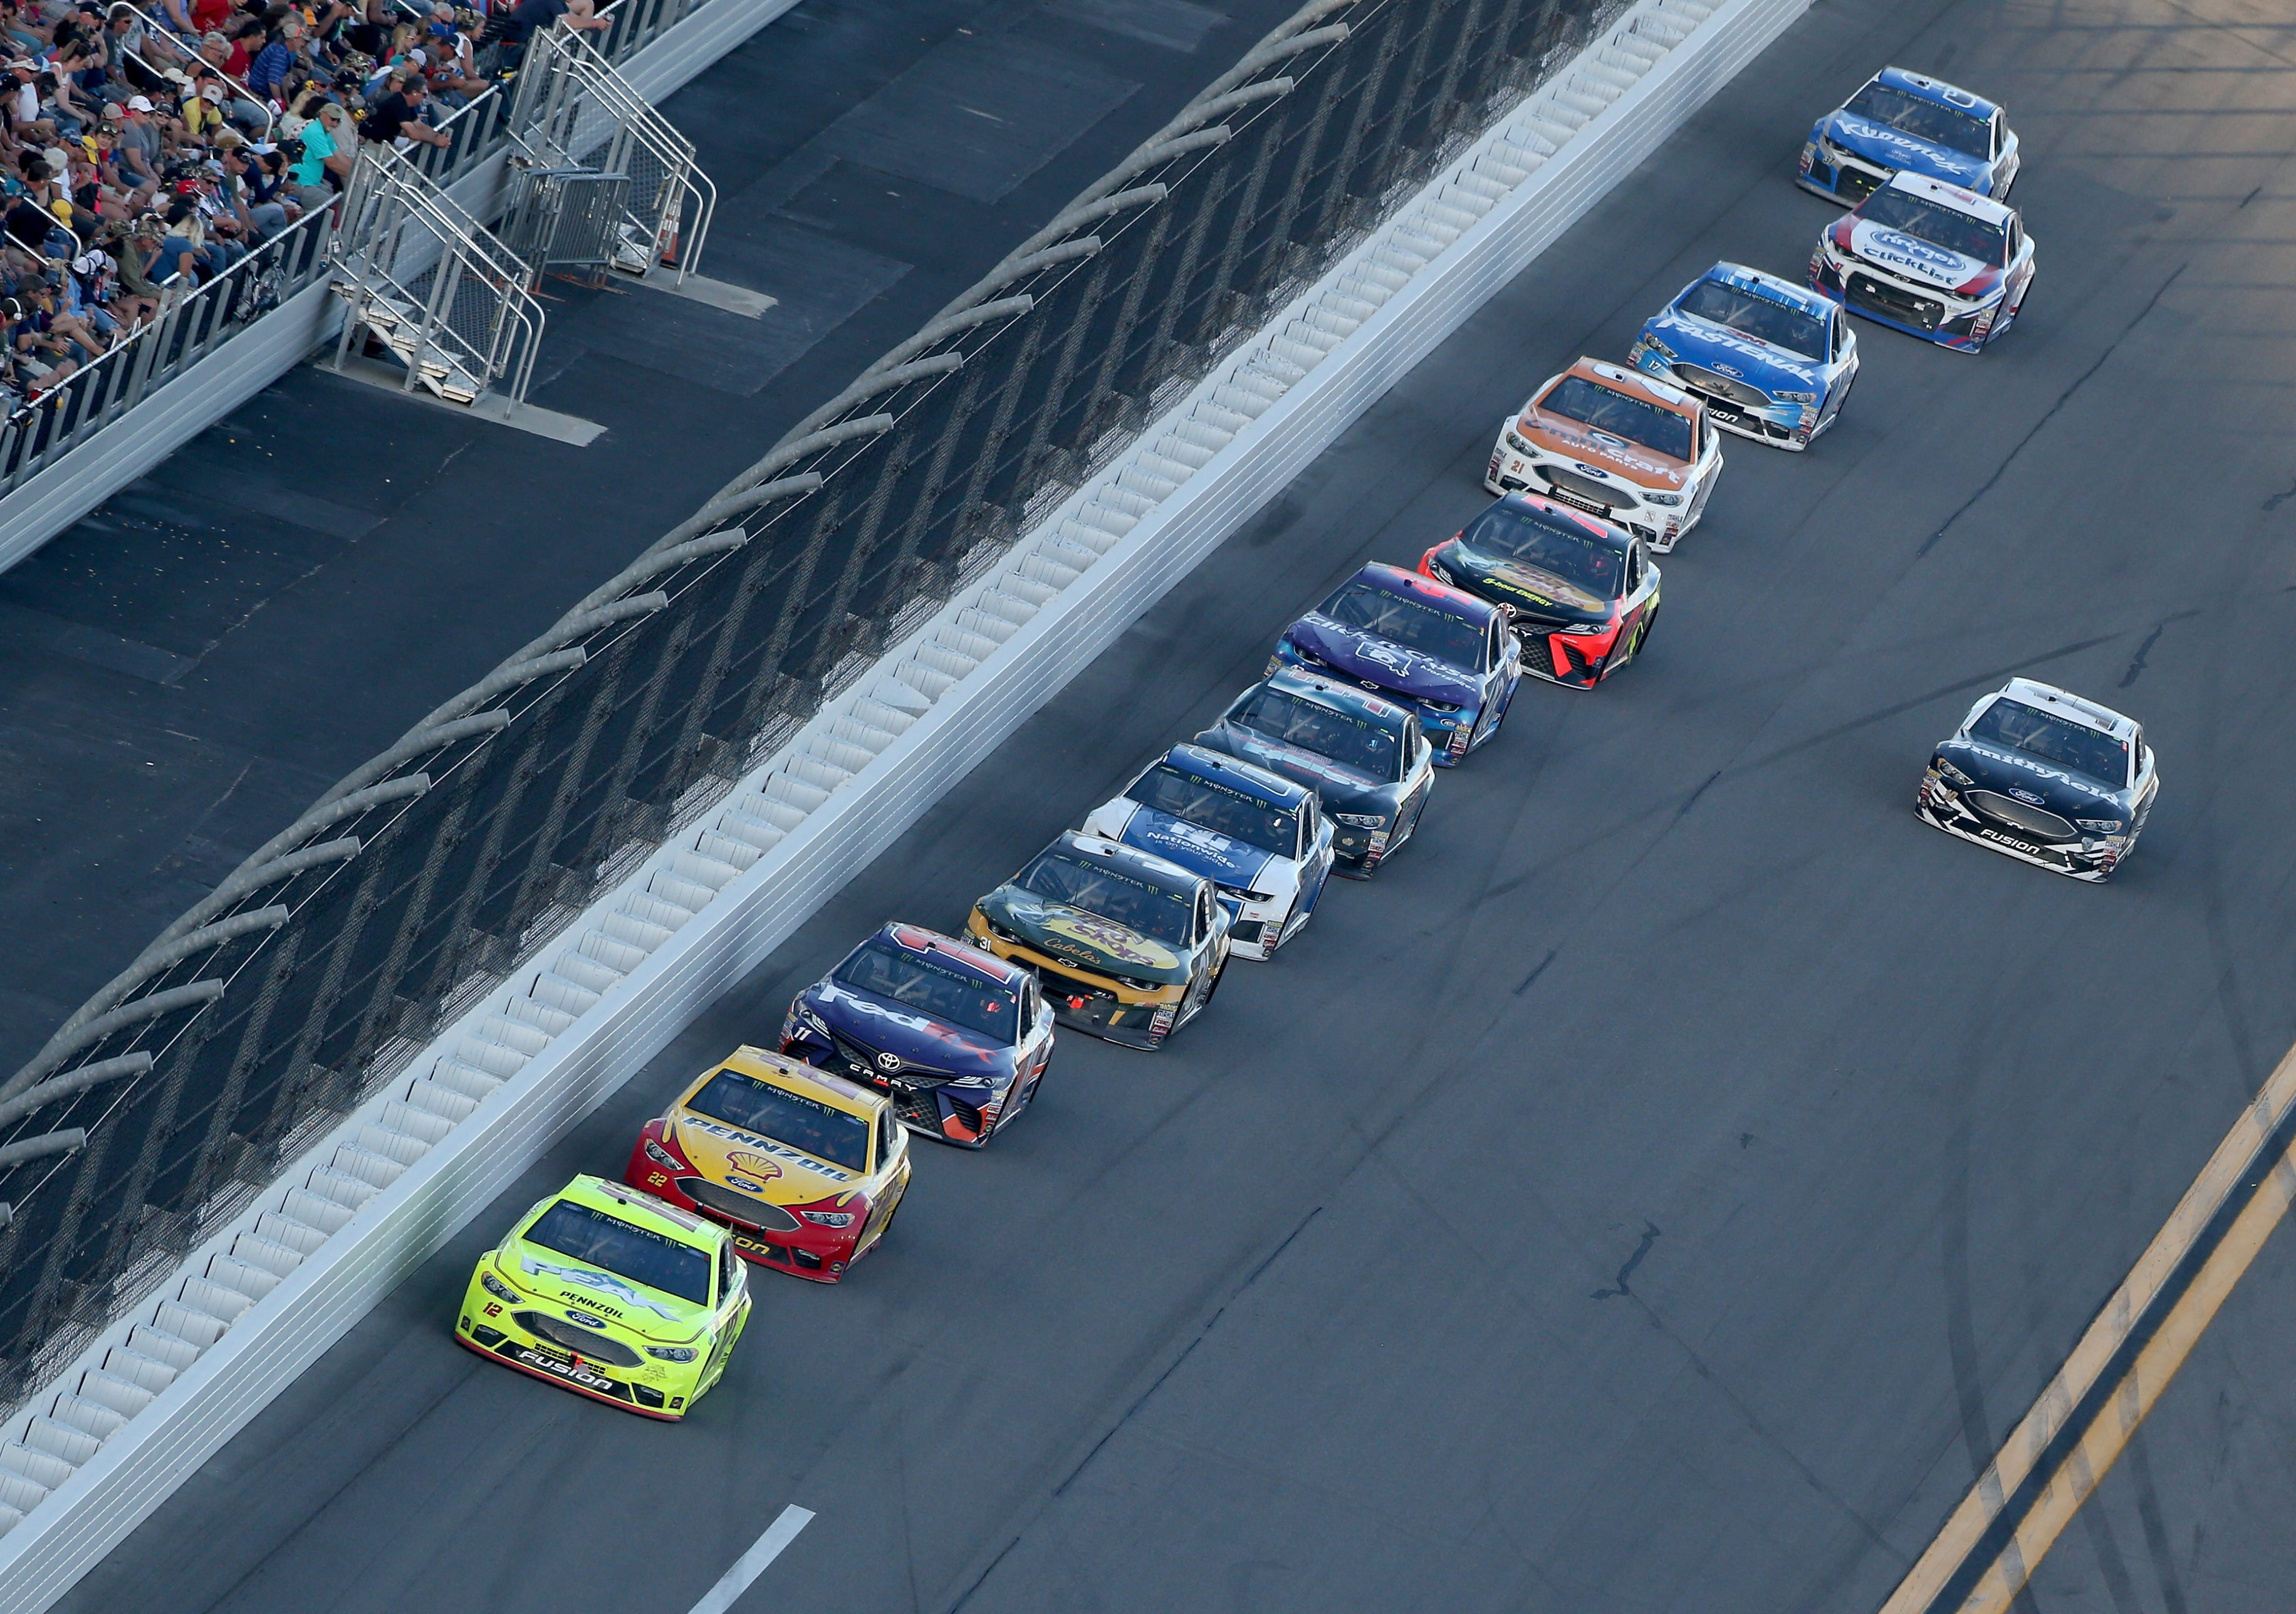 Ryan Blaney leads the Daytona 500